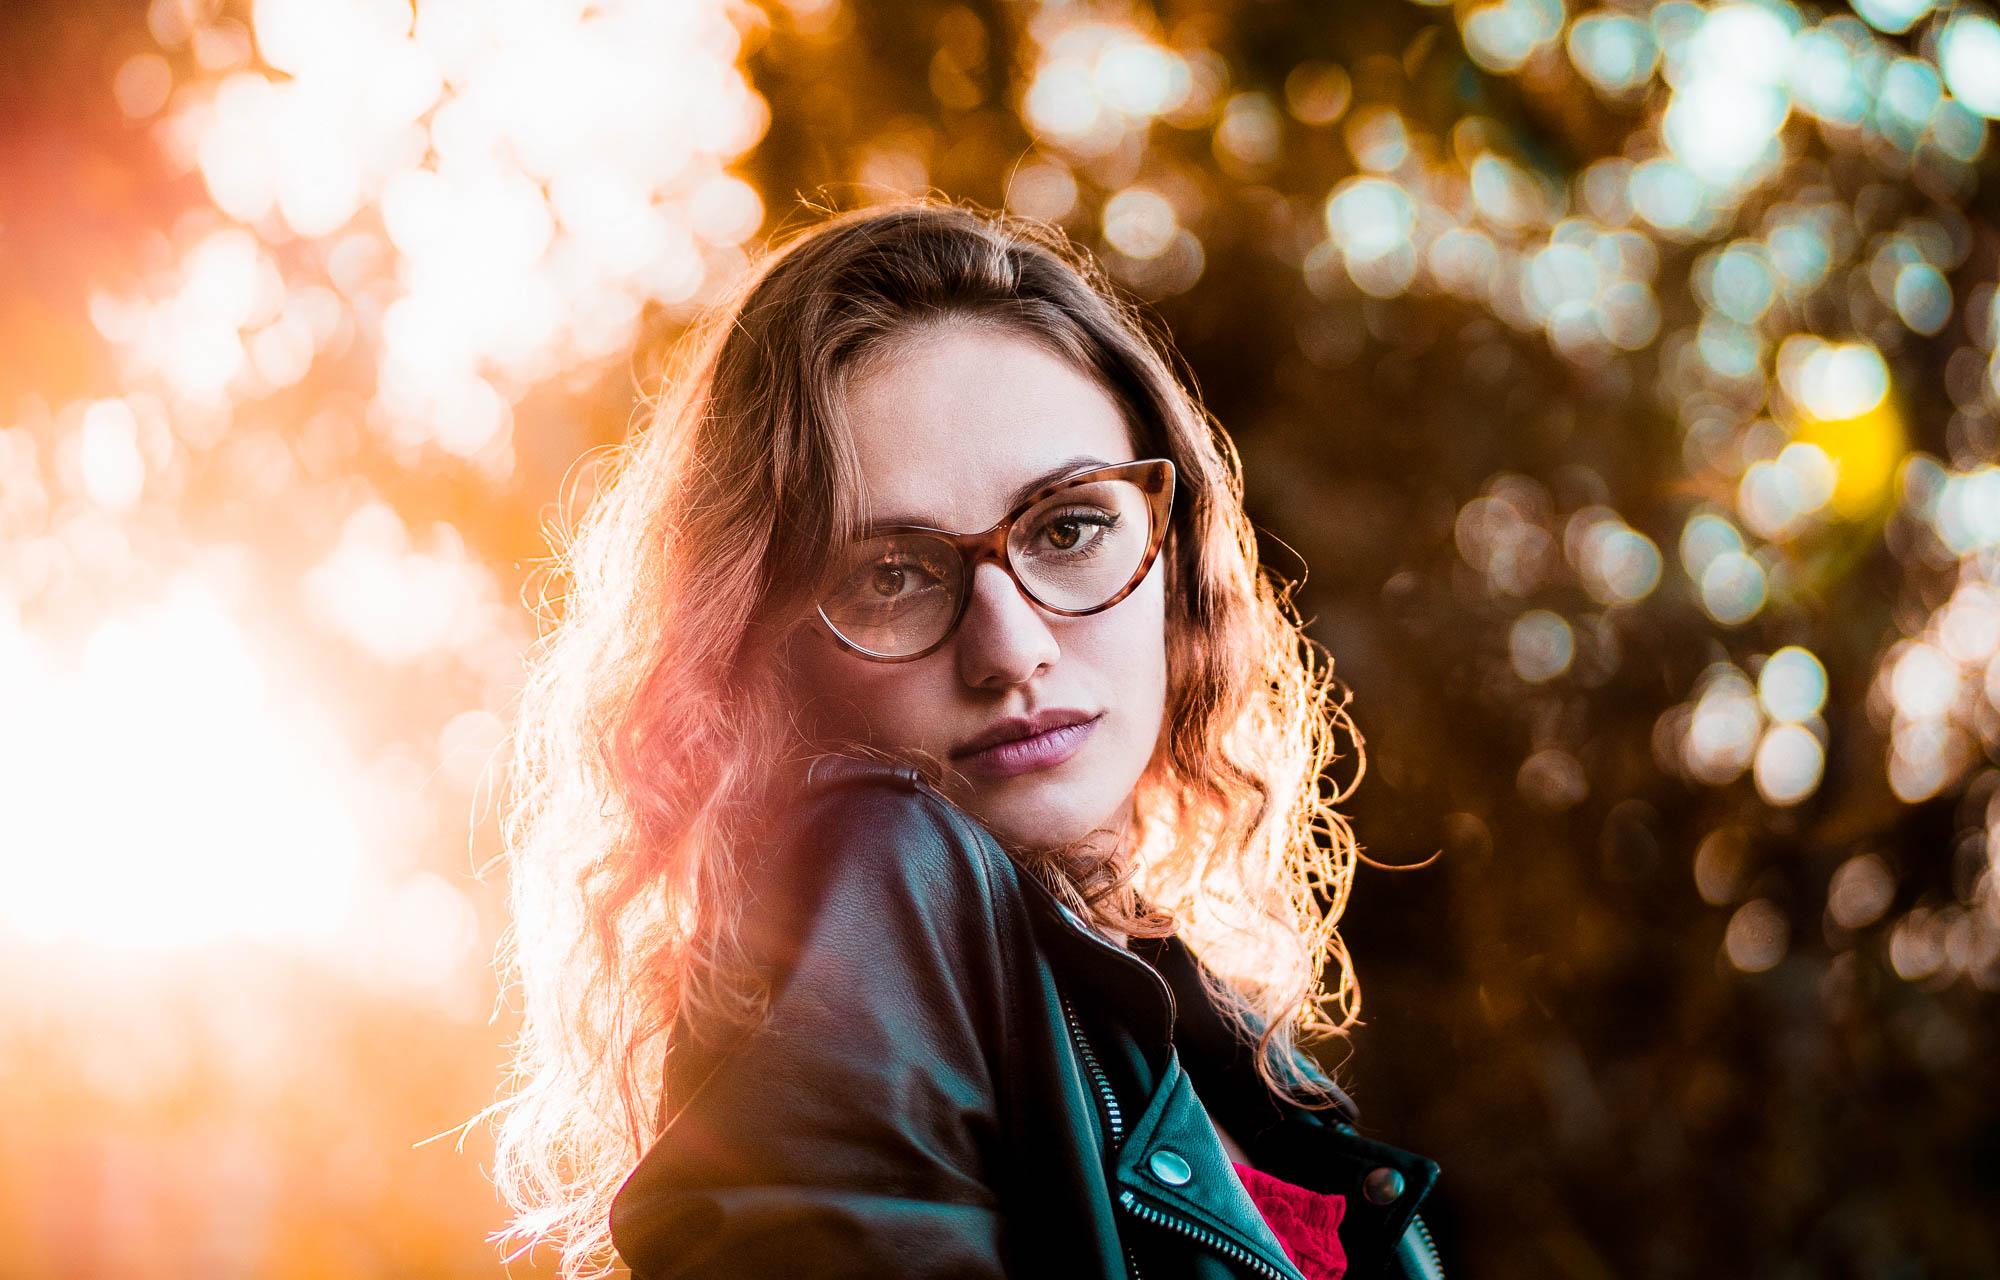 Portrait with bokeh background blur